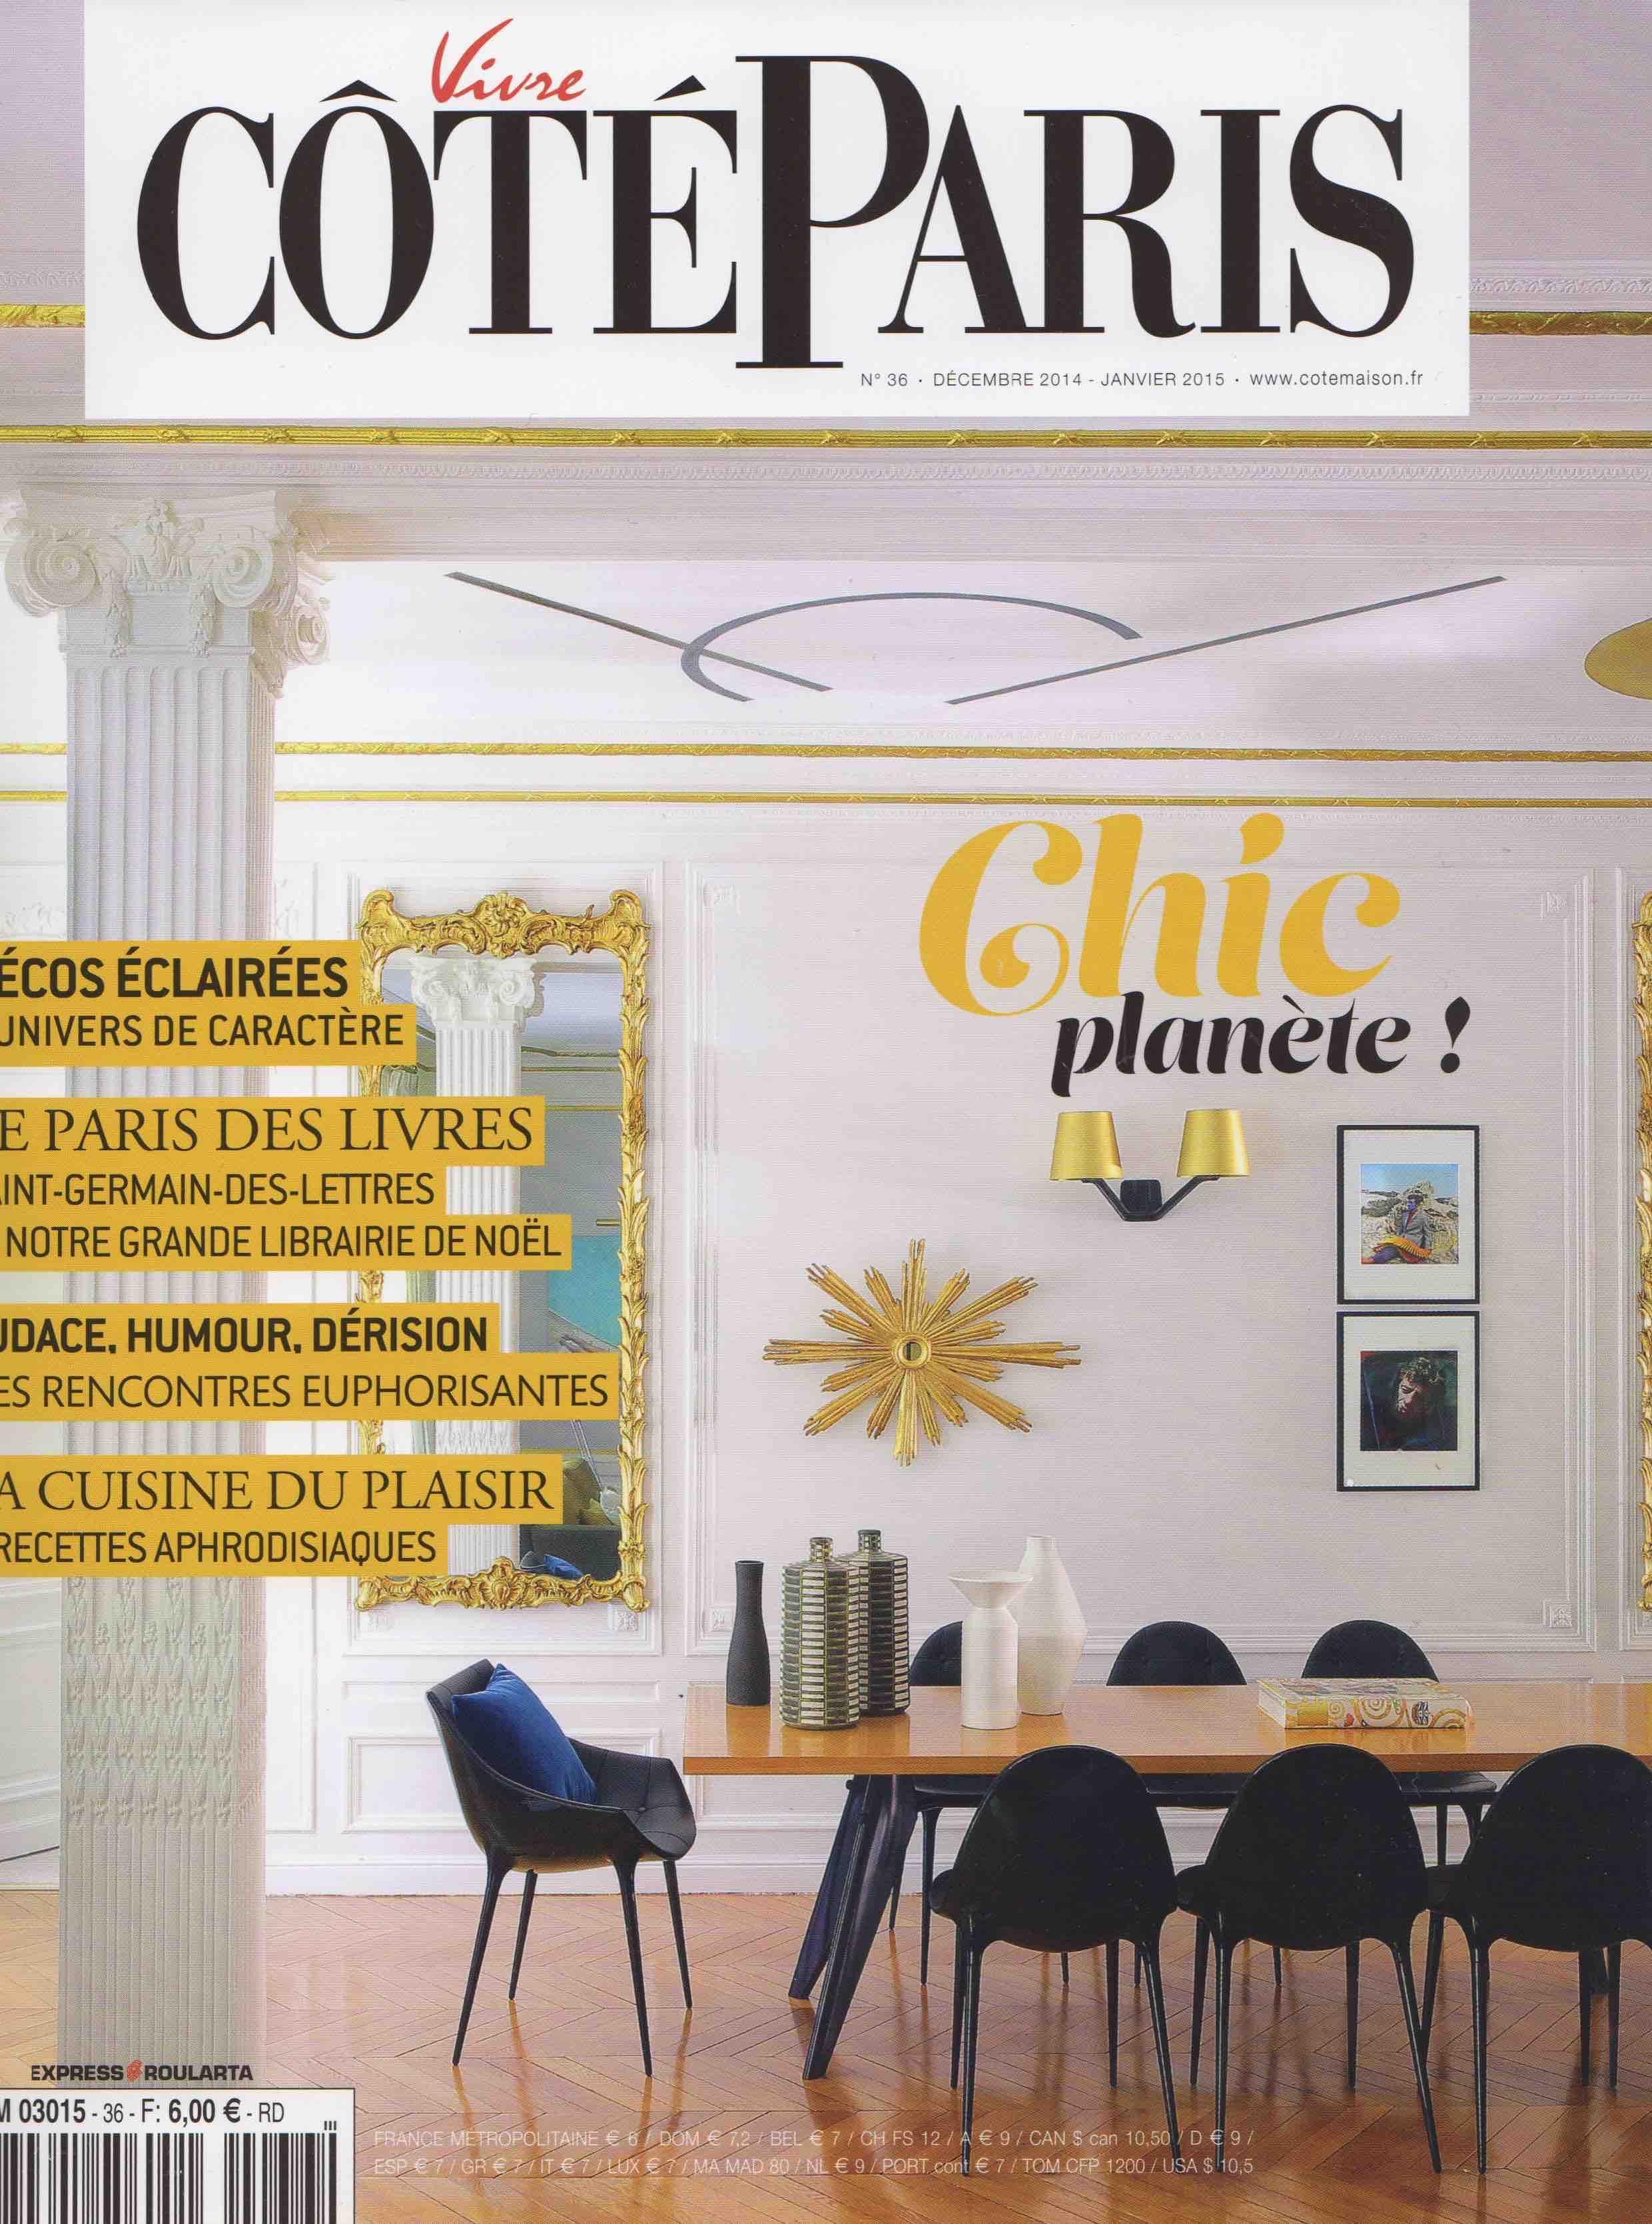 Côté Paris - Janvier 2015